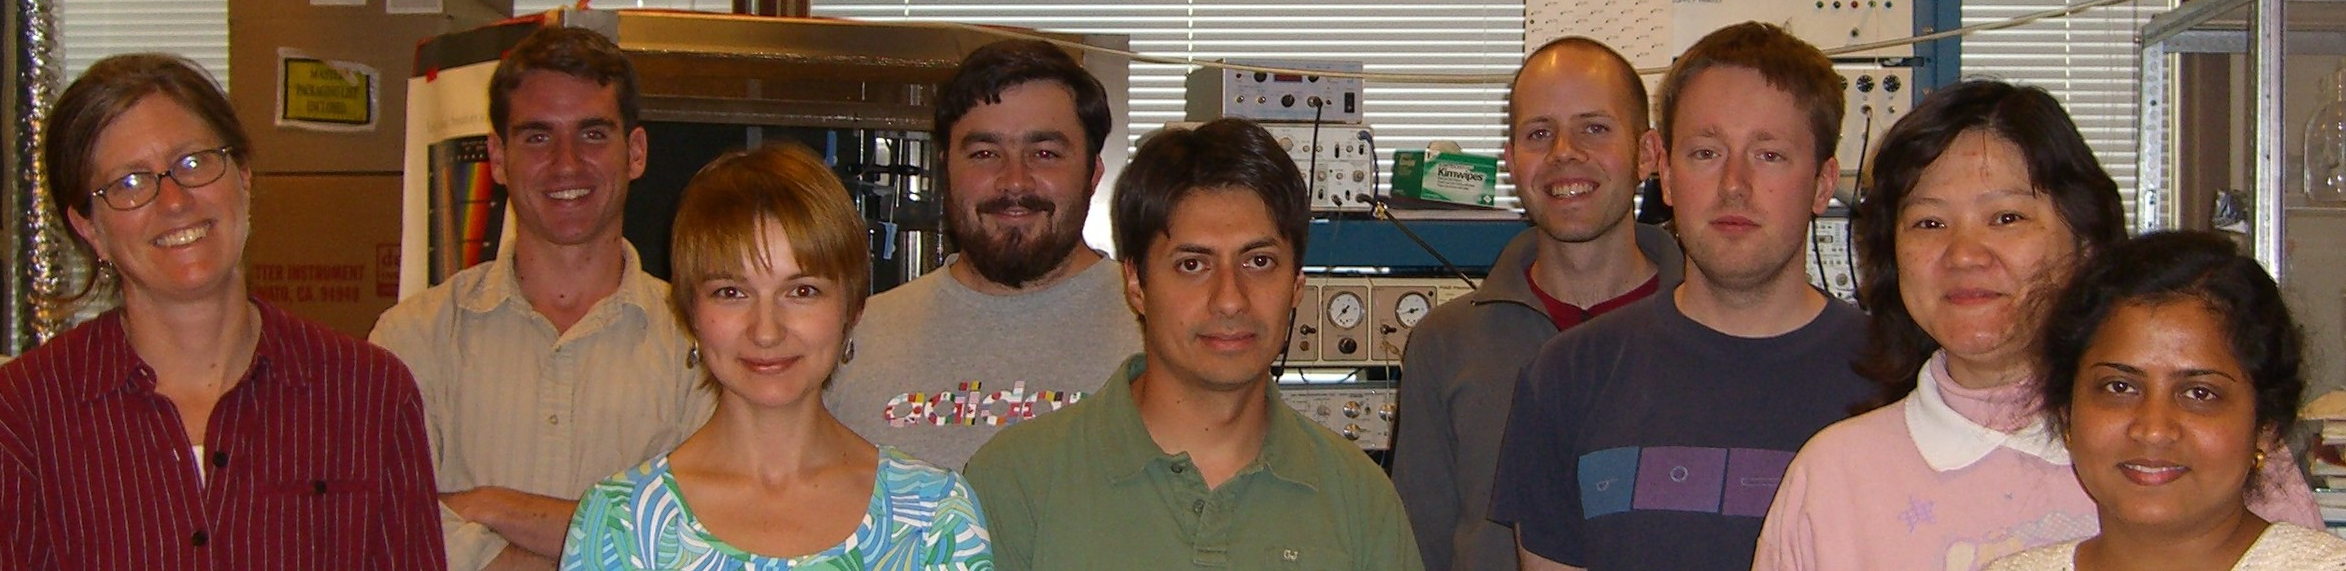 Feller lab UCSD - 2006 -- Marla, Kevin, Anastacia, Tim, Tony, Justin, Aaron, Chih-tien and Papiya Mahapatra